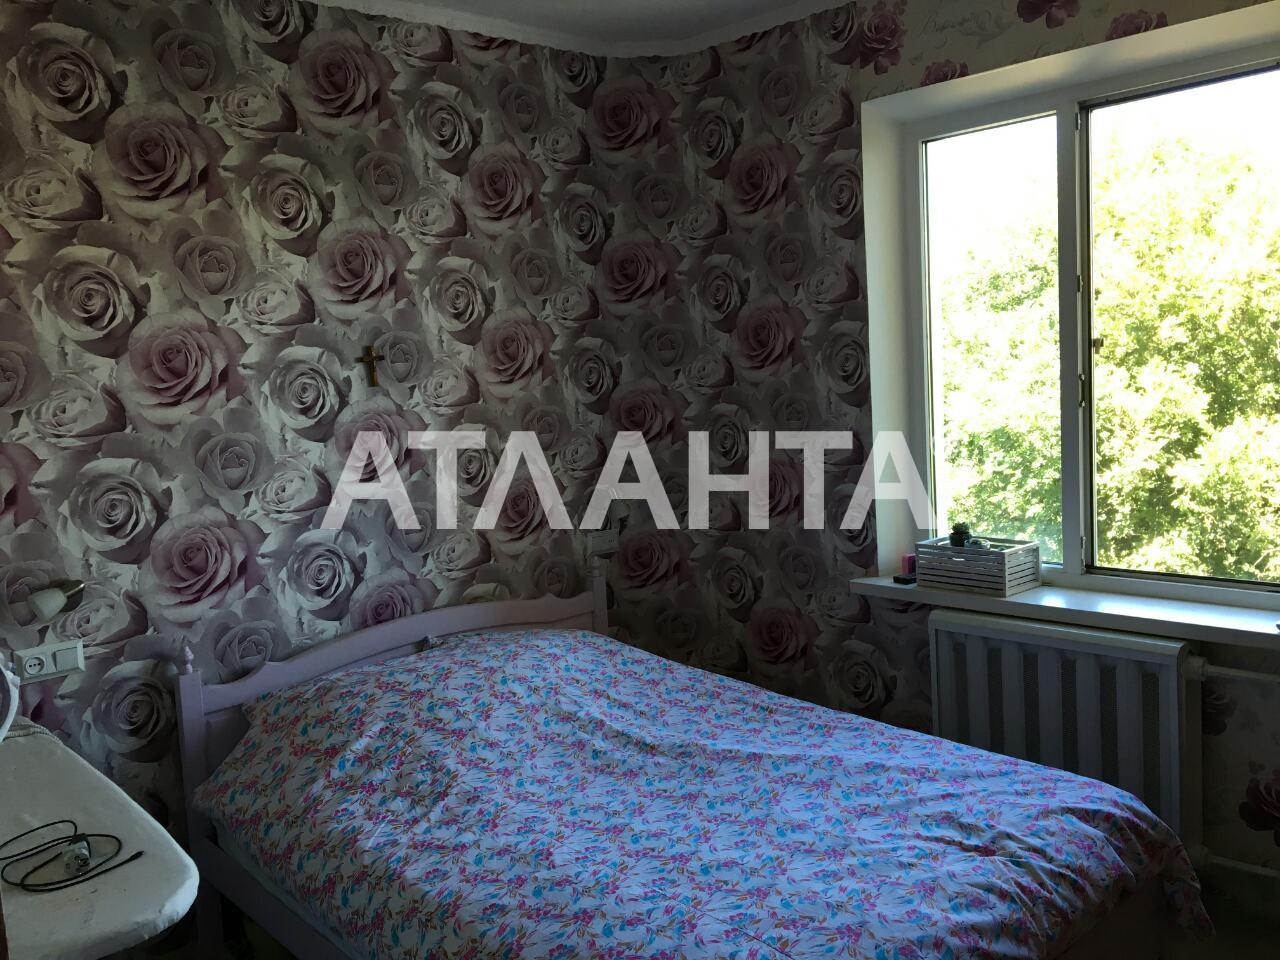 Продается 3-комнатная Квартира на ул. Архитекторская — 49 000 у.е. (фото №7)